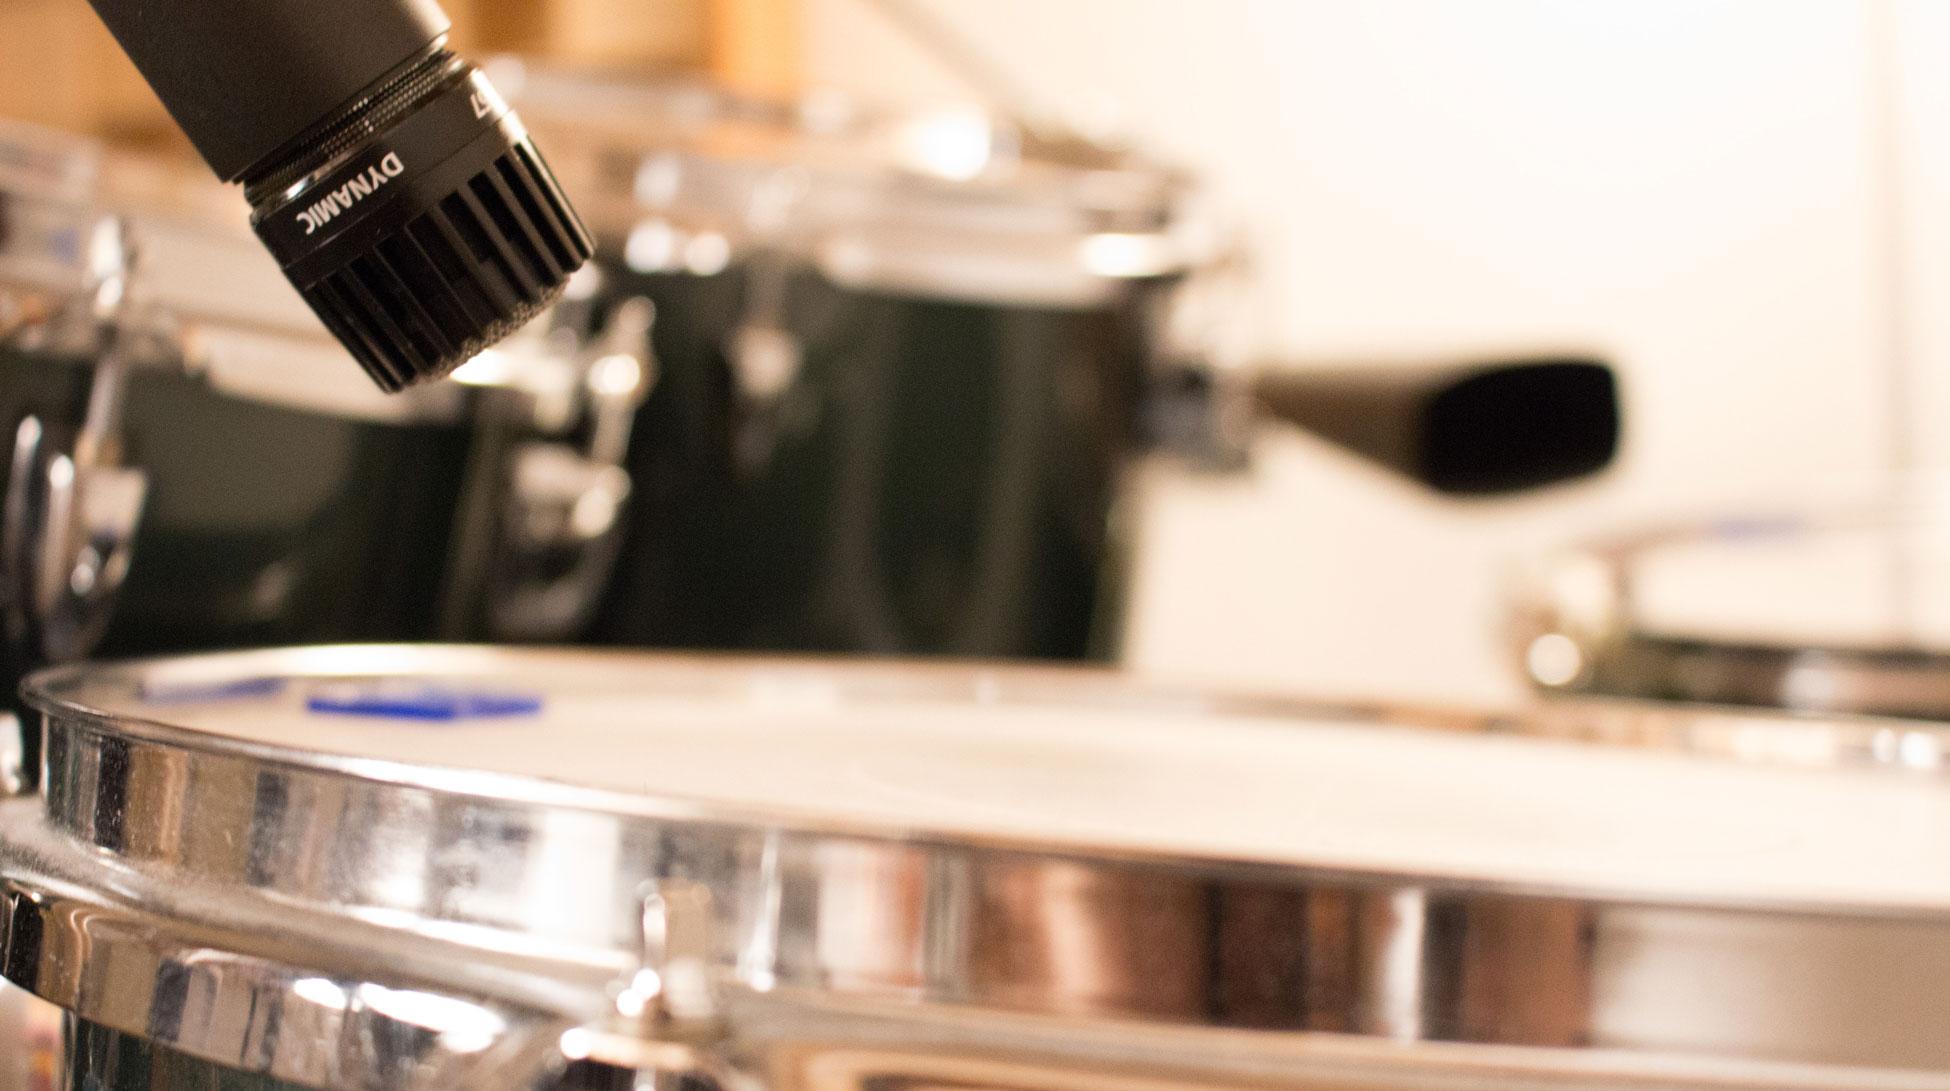 Tonstudio33 - Musikproduktion Mixing Mastering - Schlagzeug Sm57